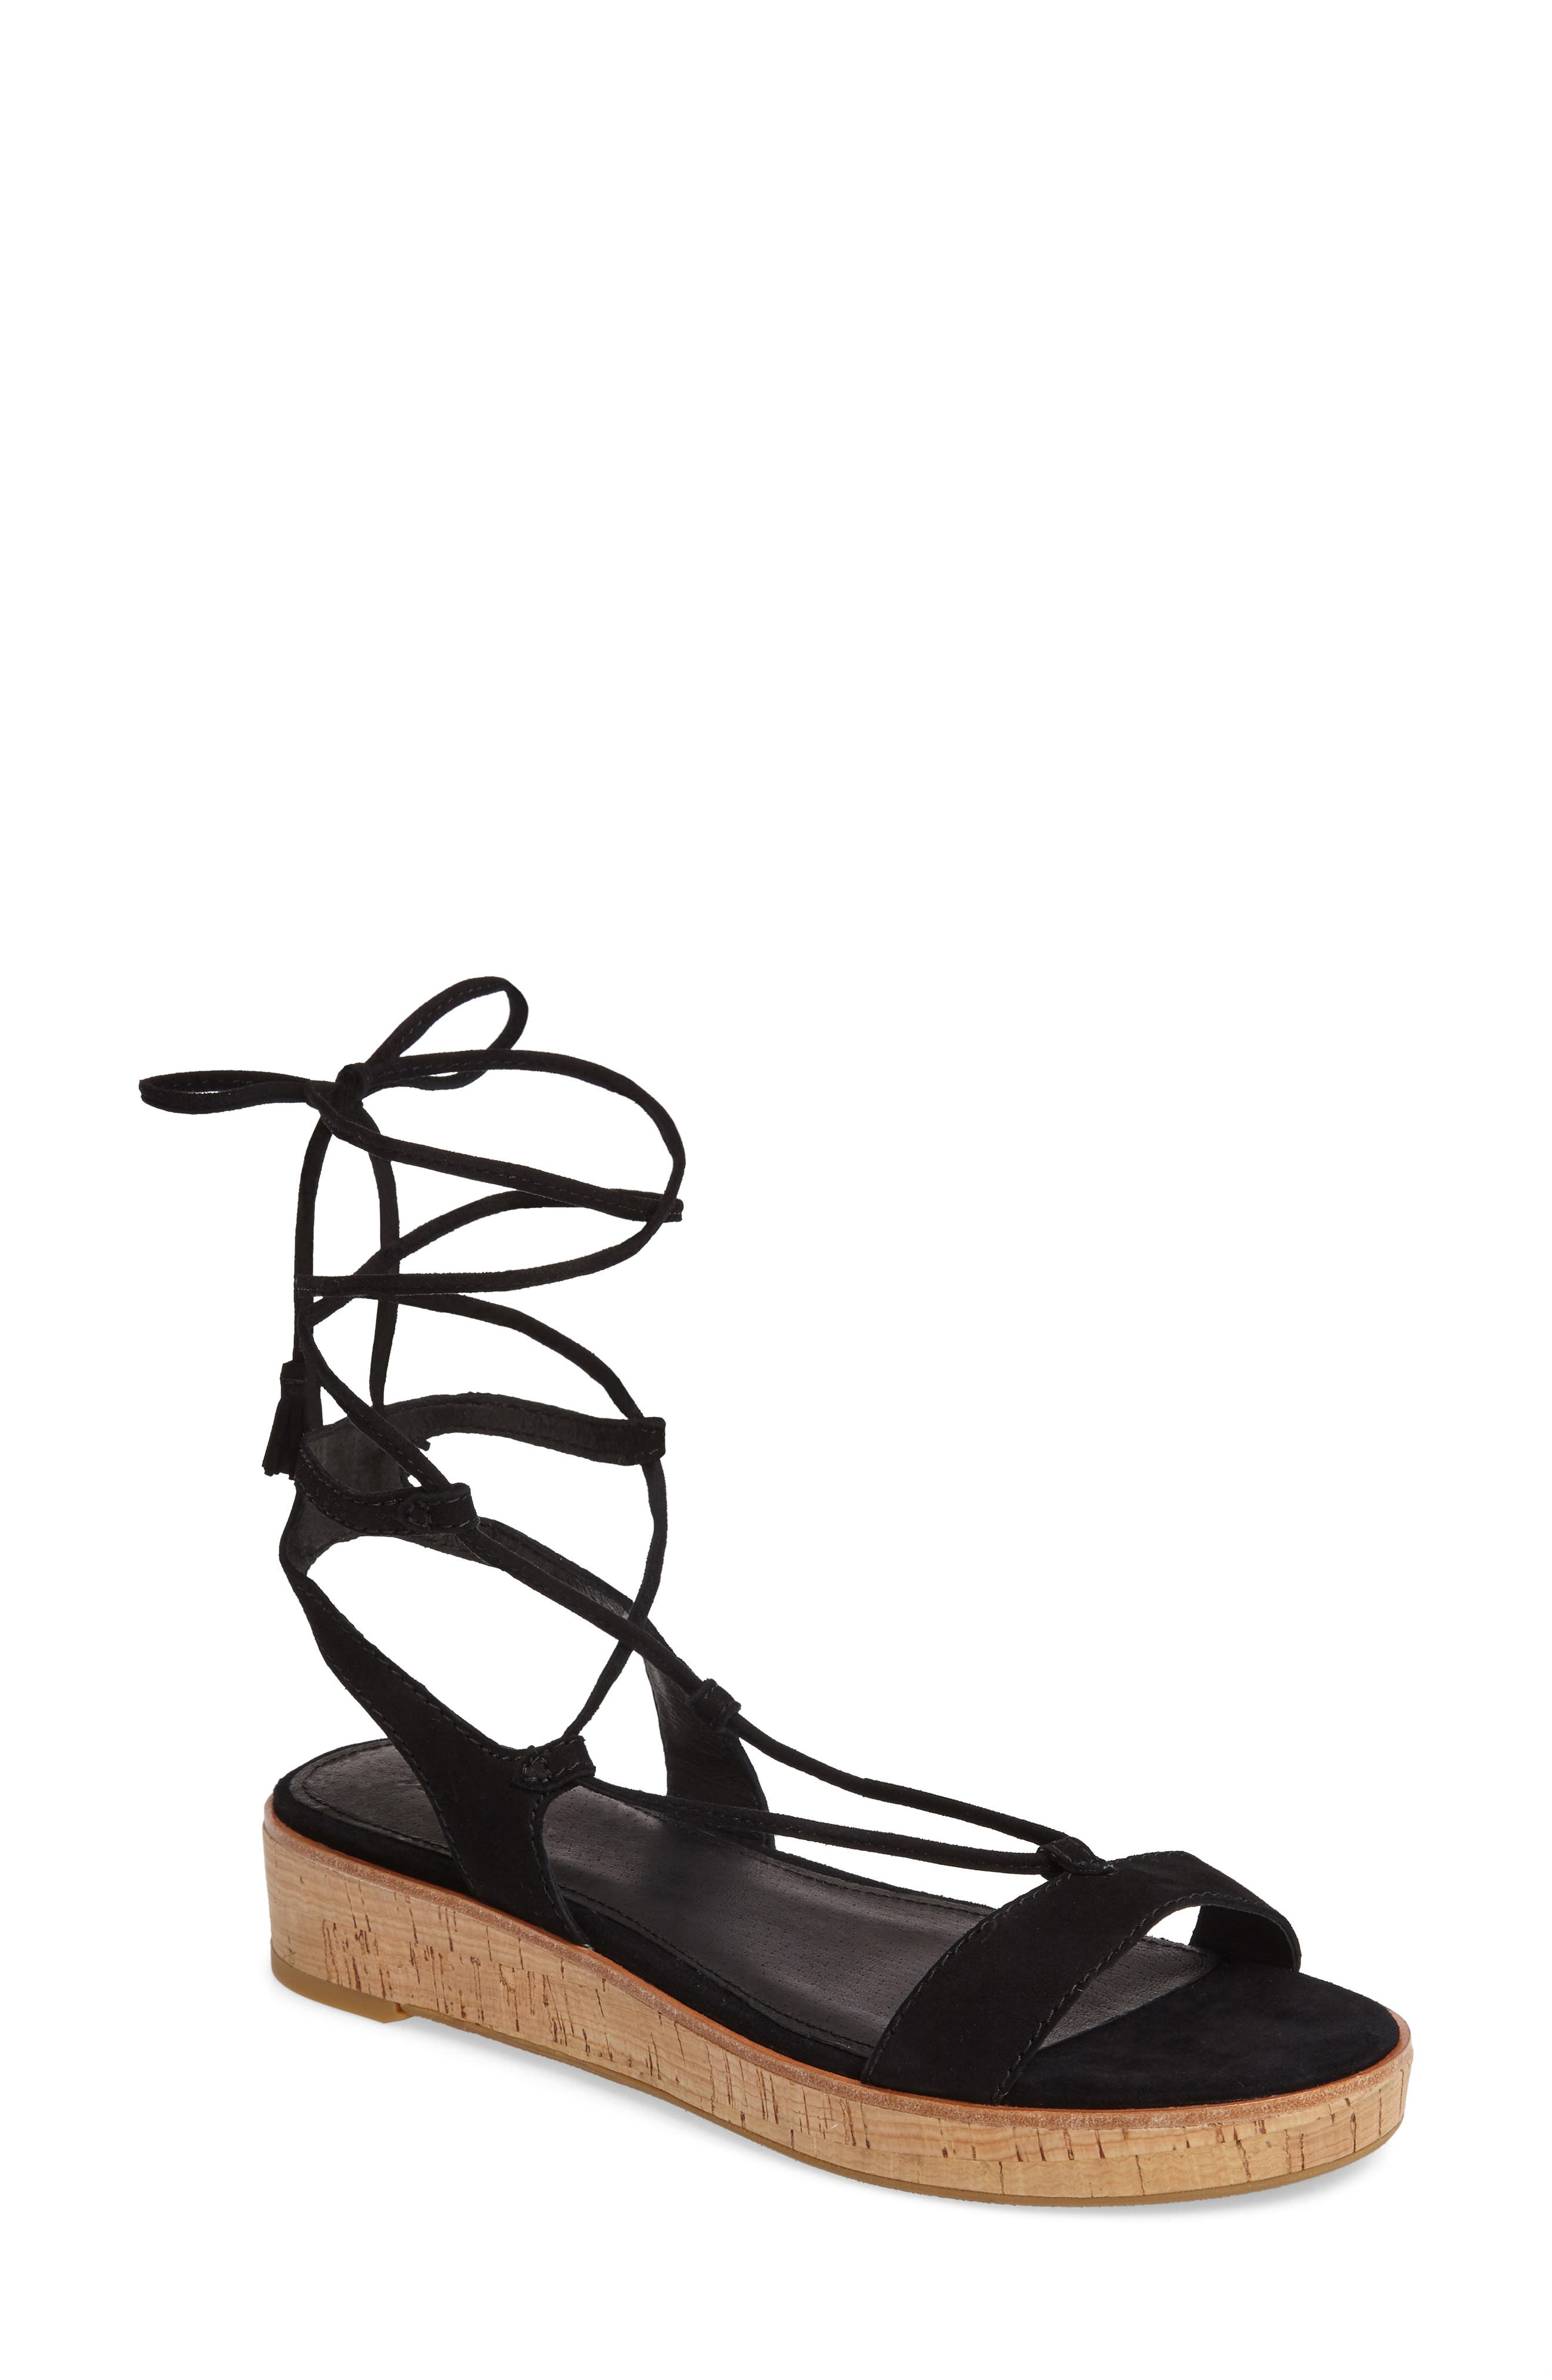 Miranda Gladiator Platform Sandal,                         Main,                         color, Black Suede